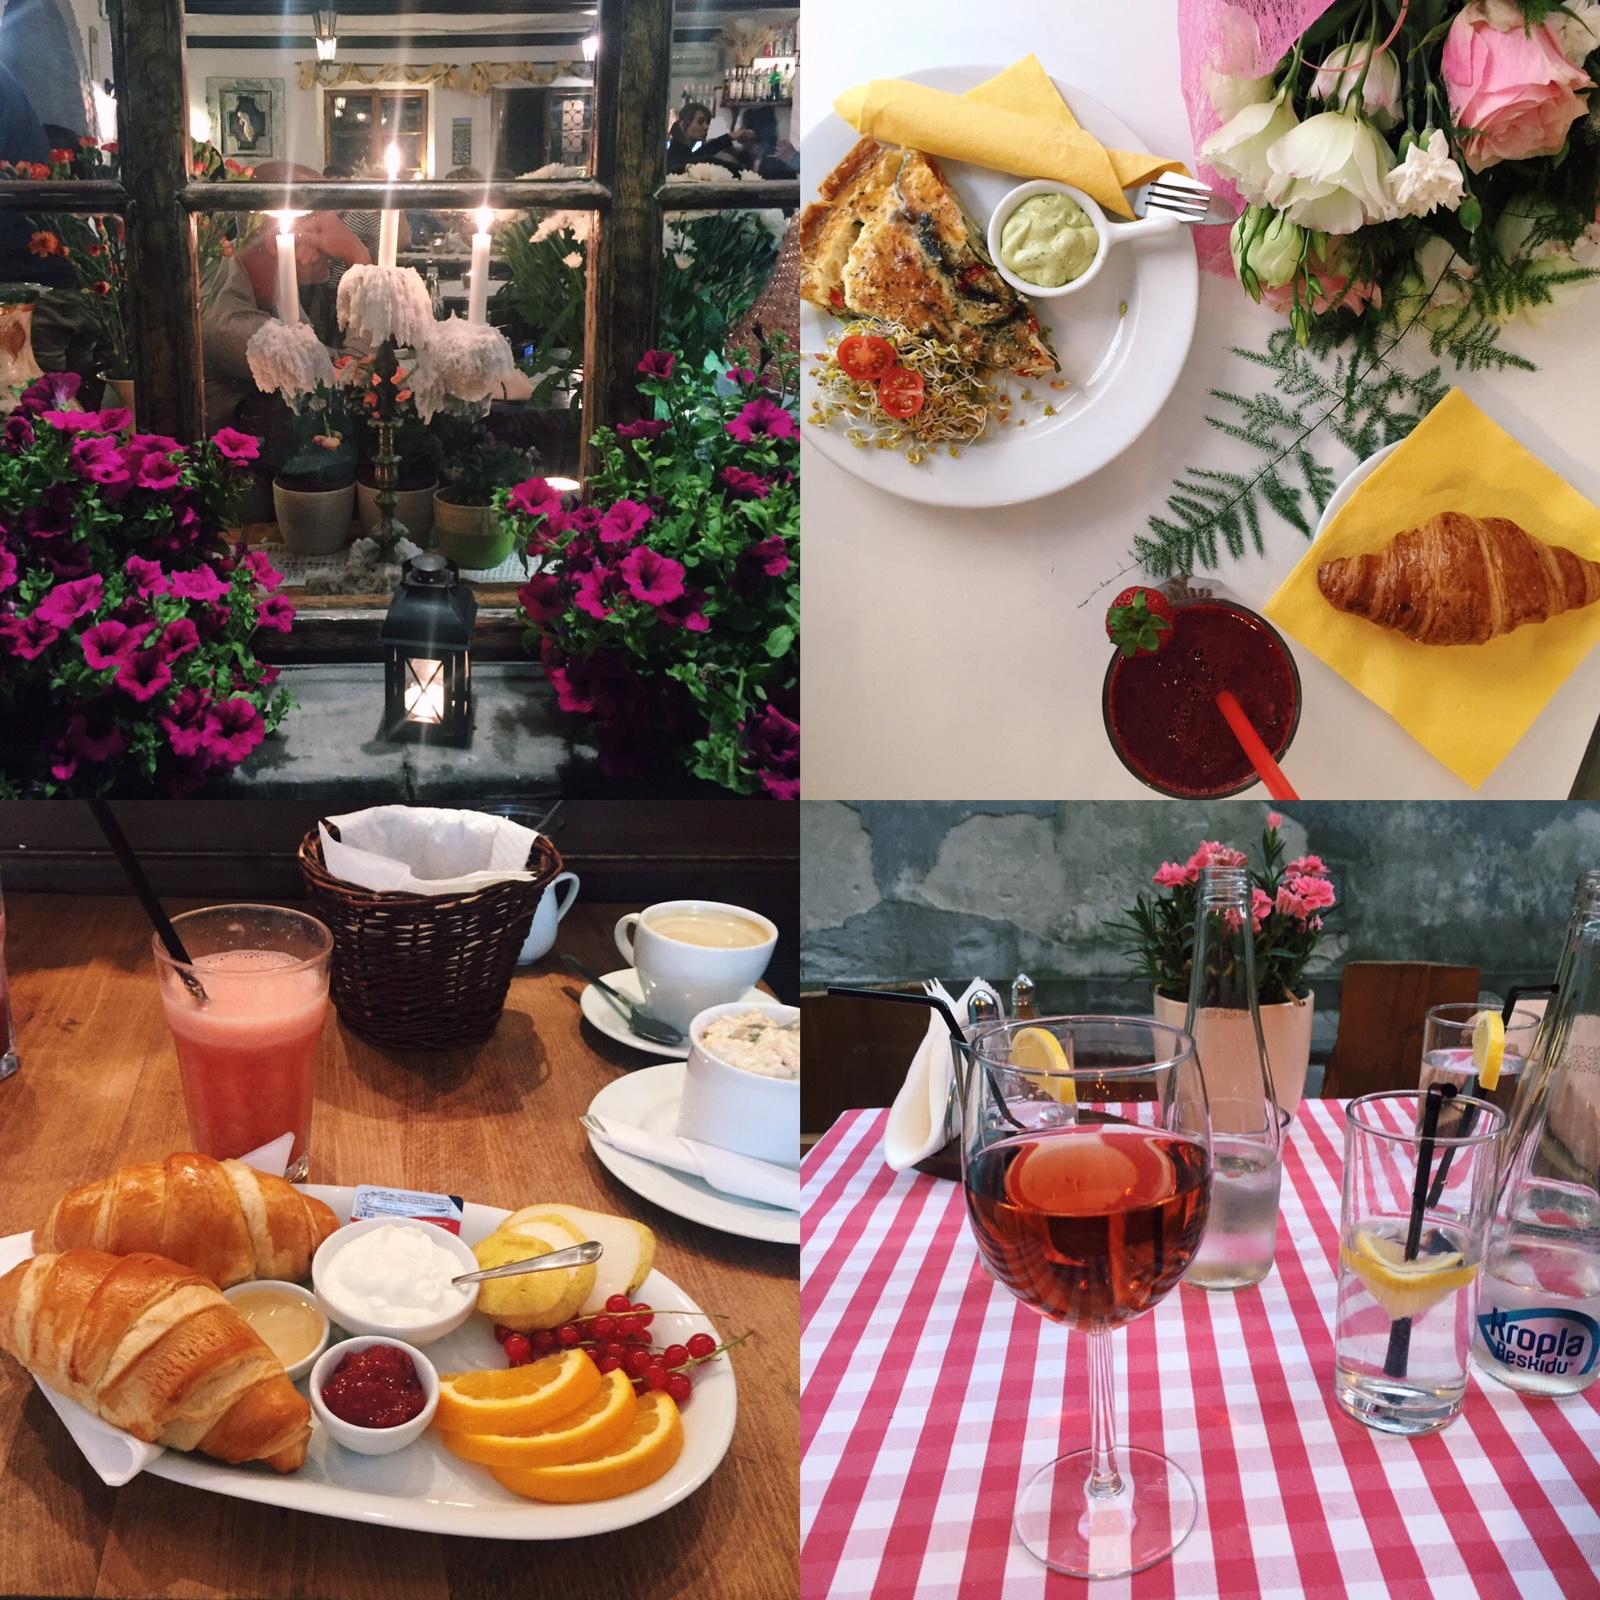 Windows of Gospoda Kwiaty, breakfasts and some summer rose outdoors